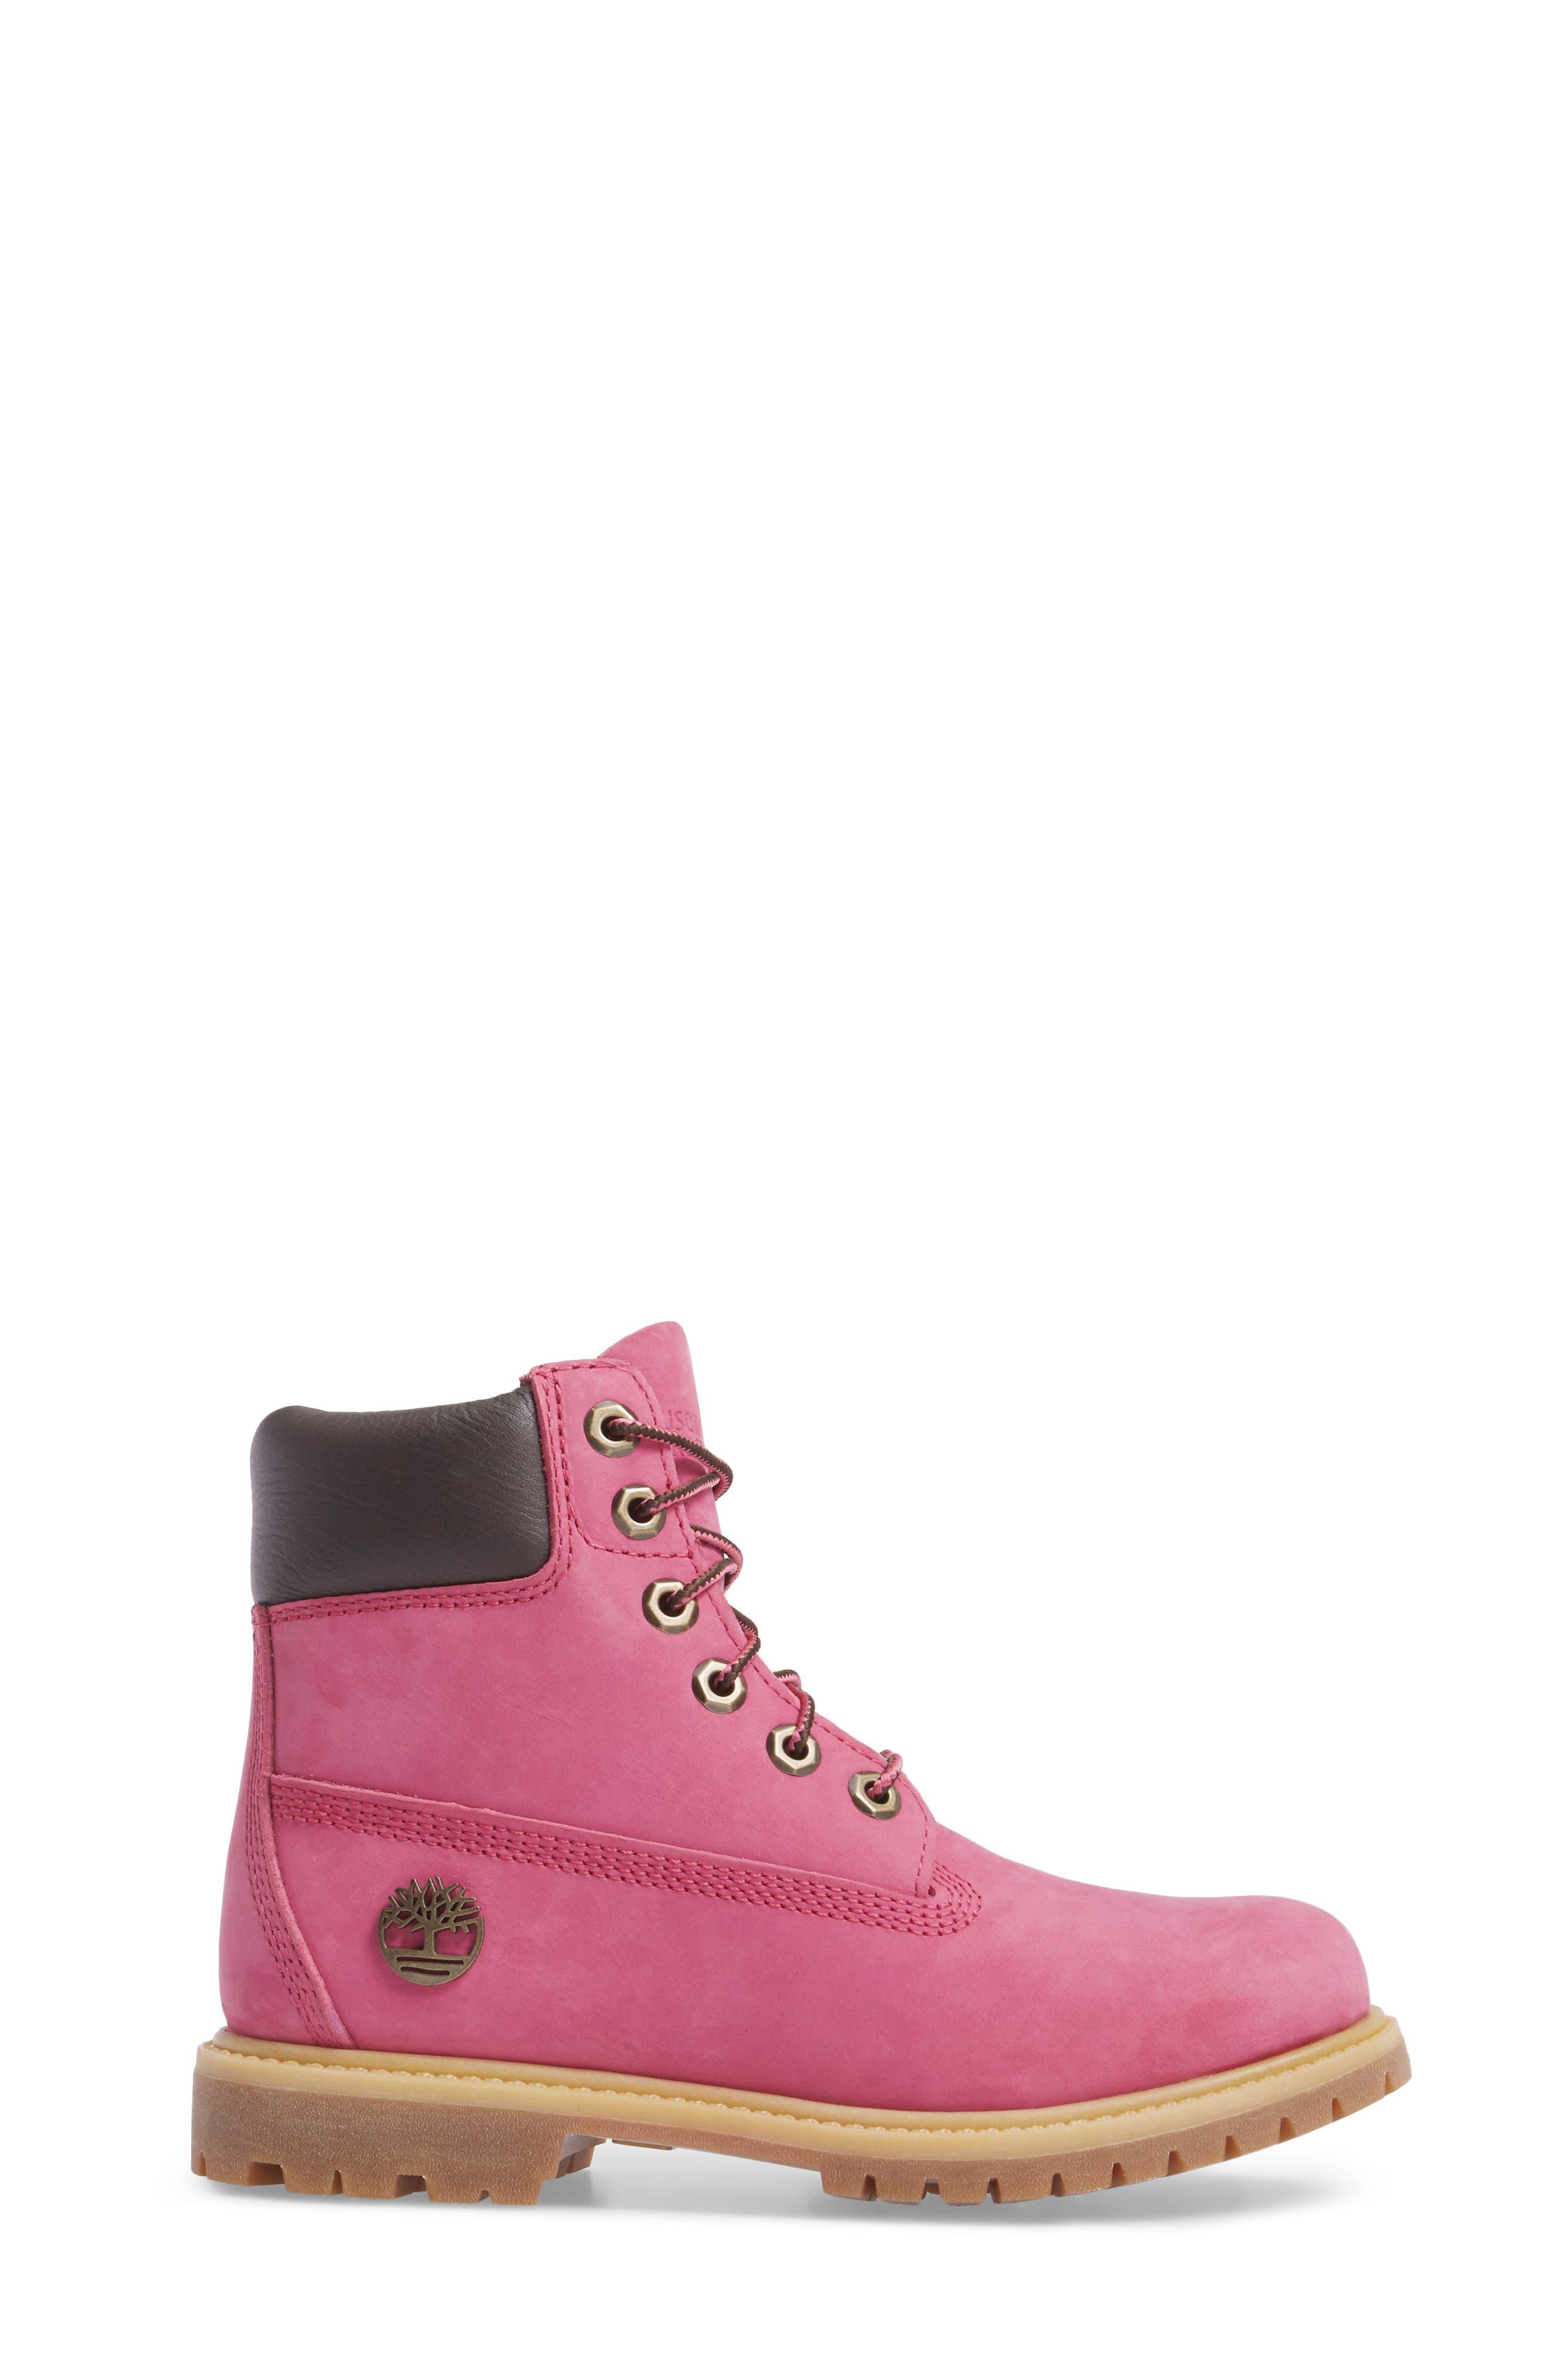 x Susan G. Komen 6-Inch Waterproof Insulated Boot,                             Alternate thumbnail 3, color,                             678